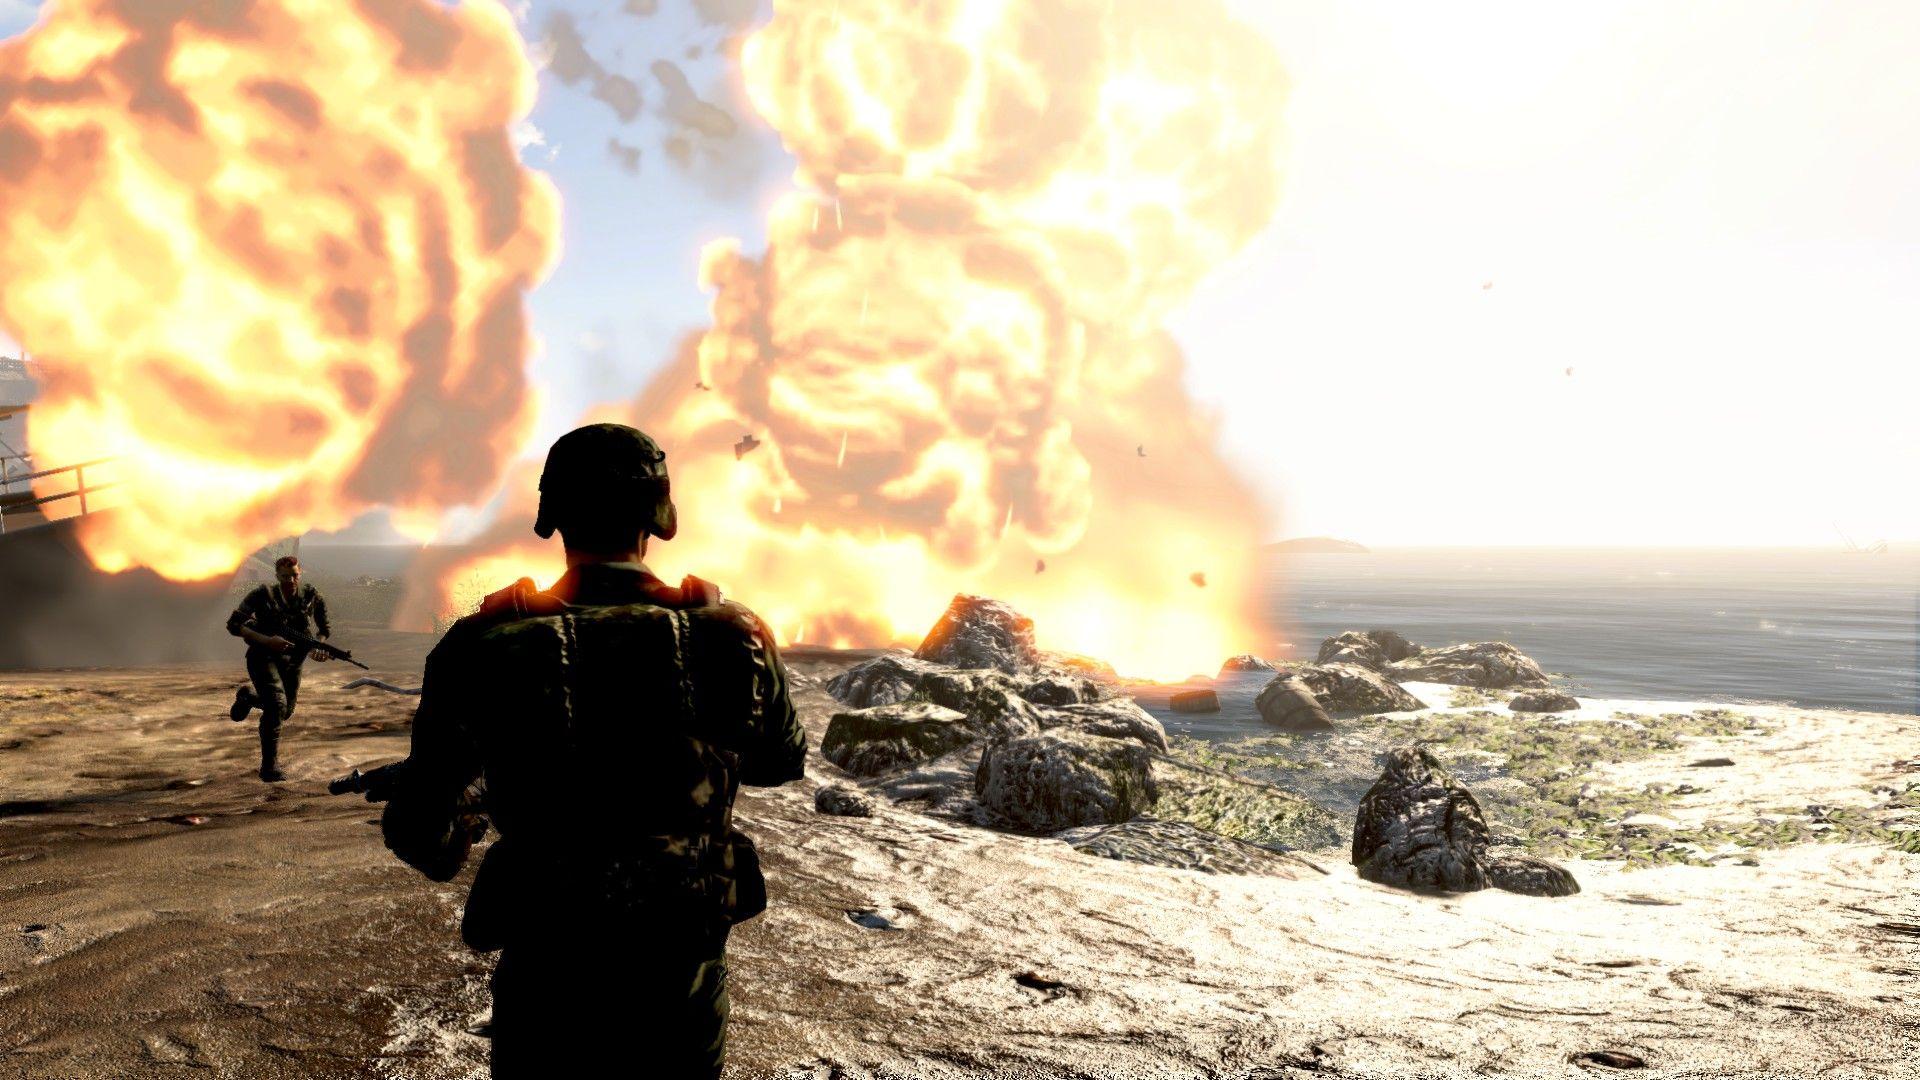 Wasteland Grunts - Gunners reimagined - Fallout 4 Mod, Cheat